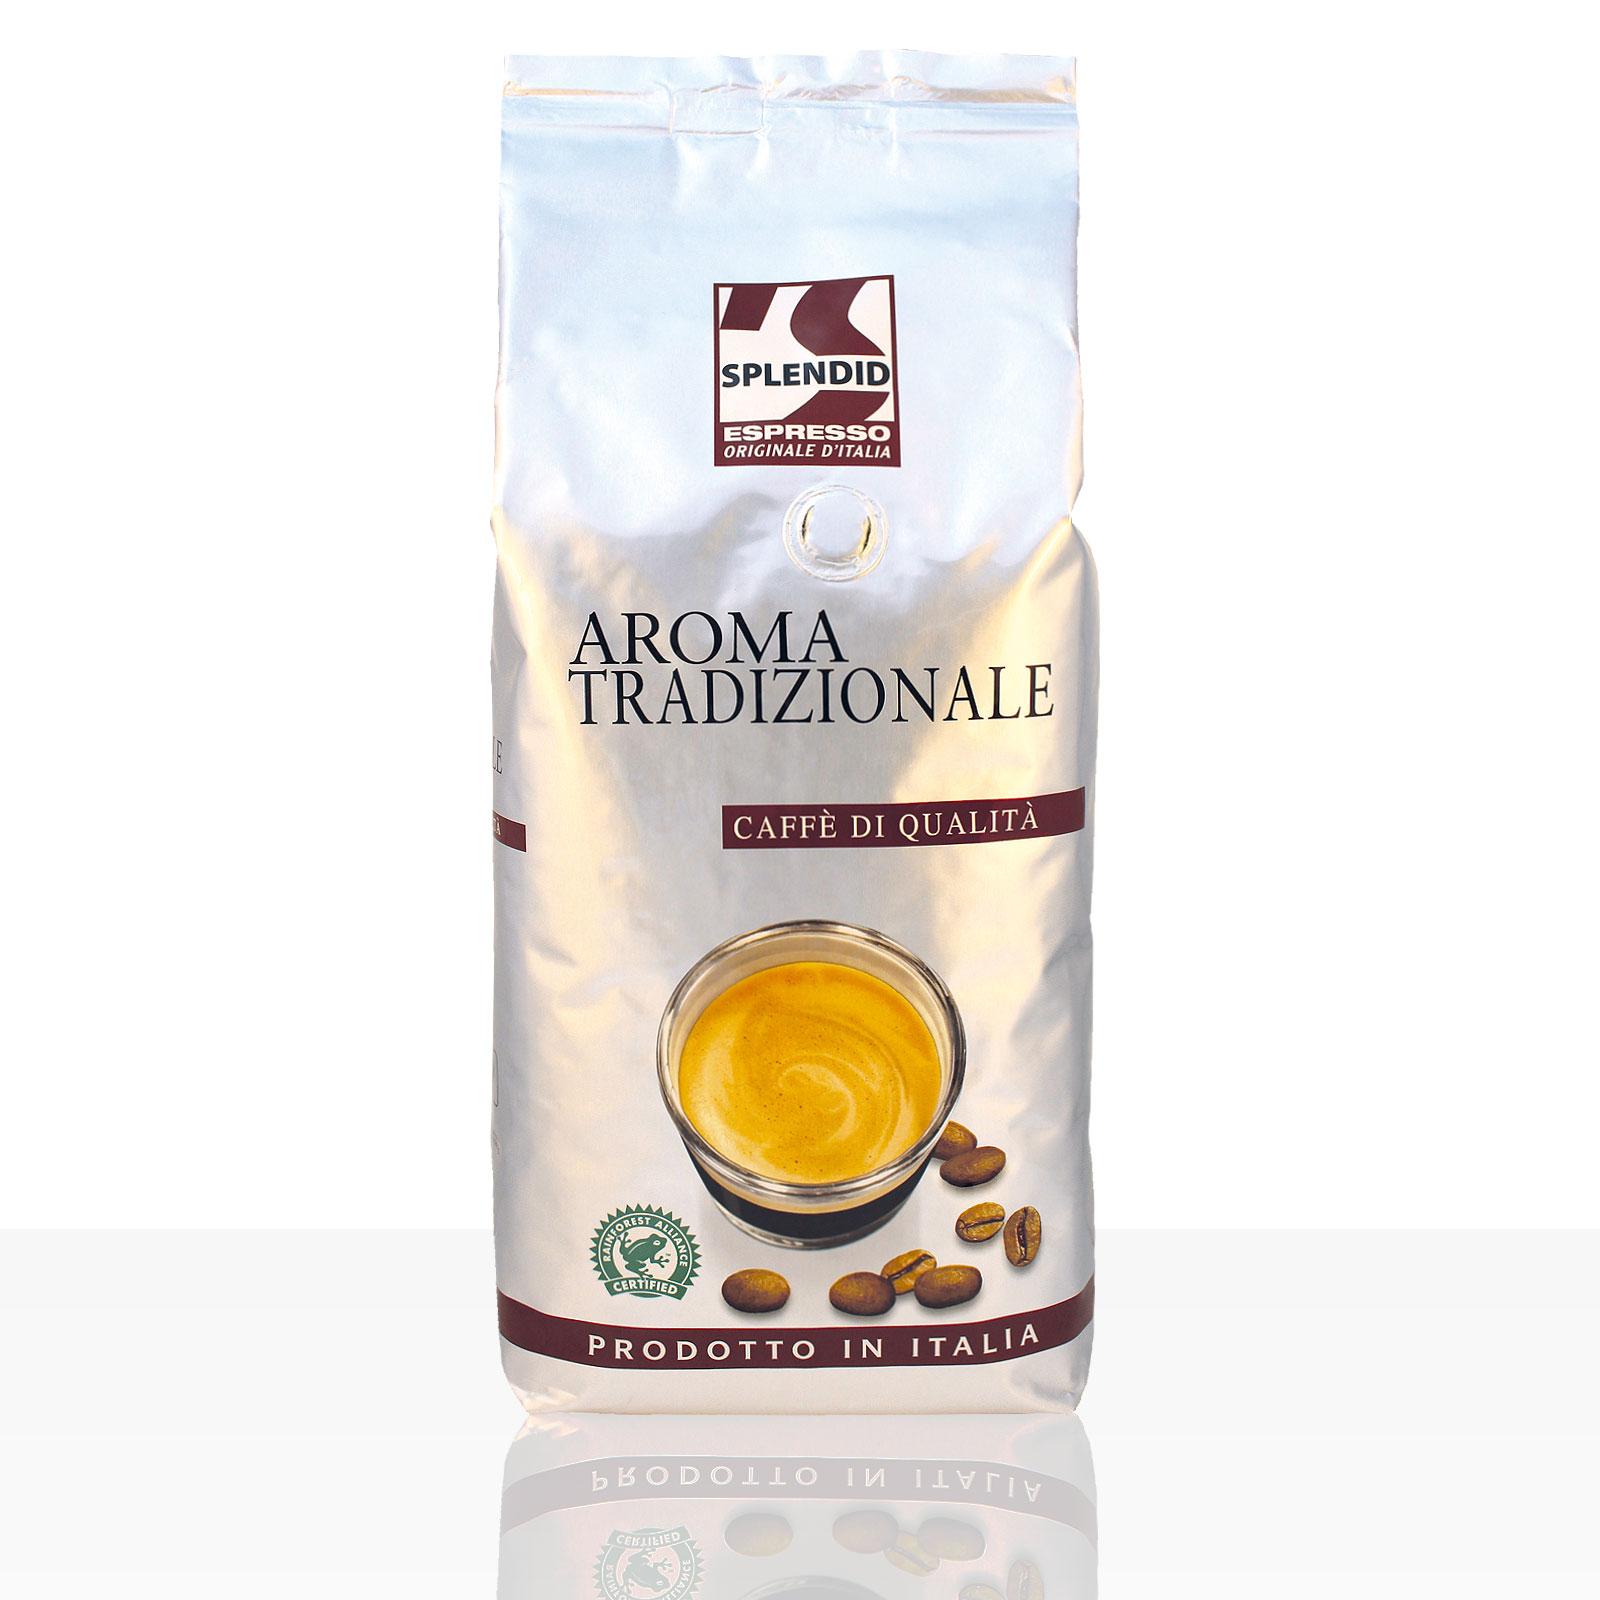 Splendid Espresso Aroma Tradizionale -  8 x 1kg ganze Kaffee-Bohne